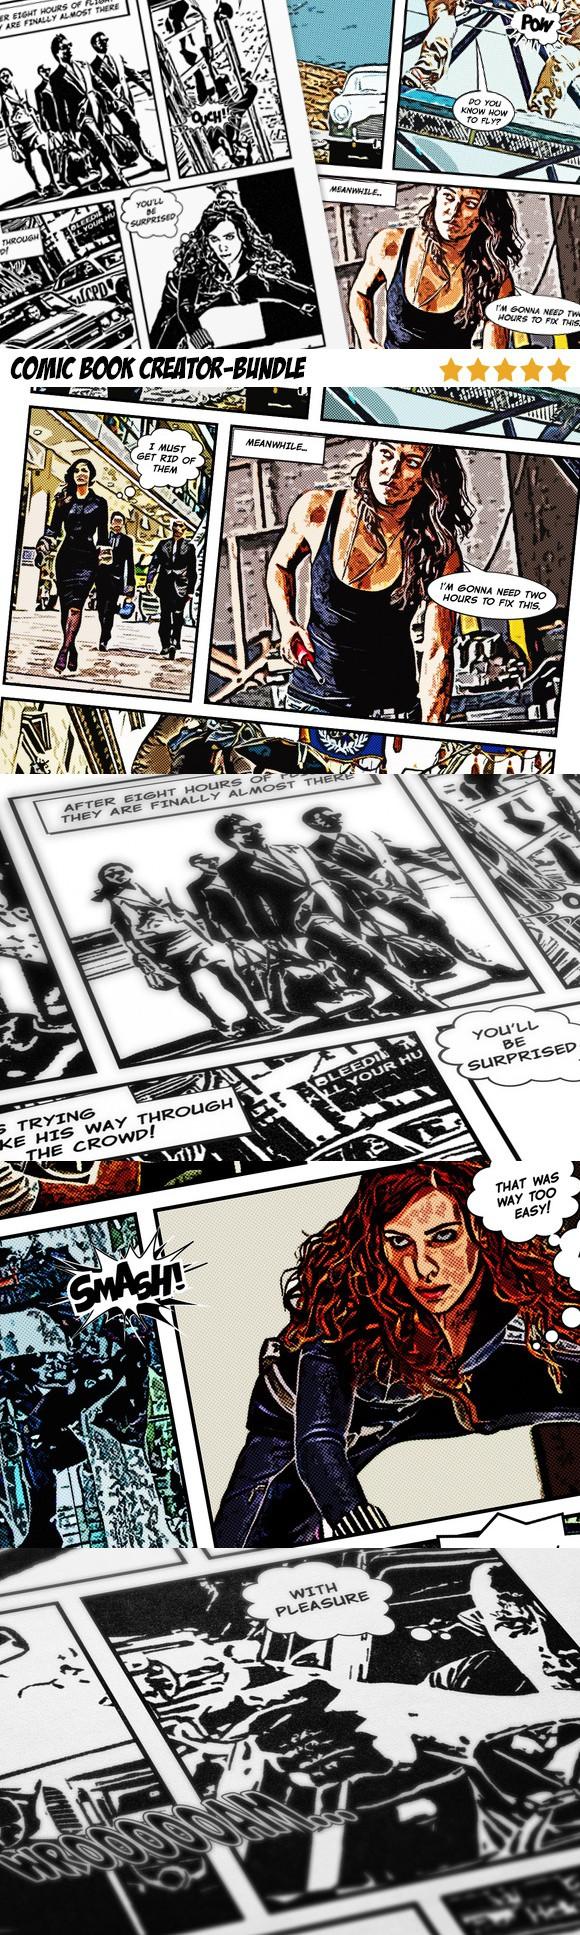 Comic Book Creator Bundle Actions 2000